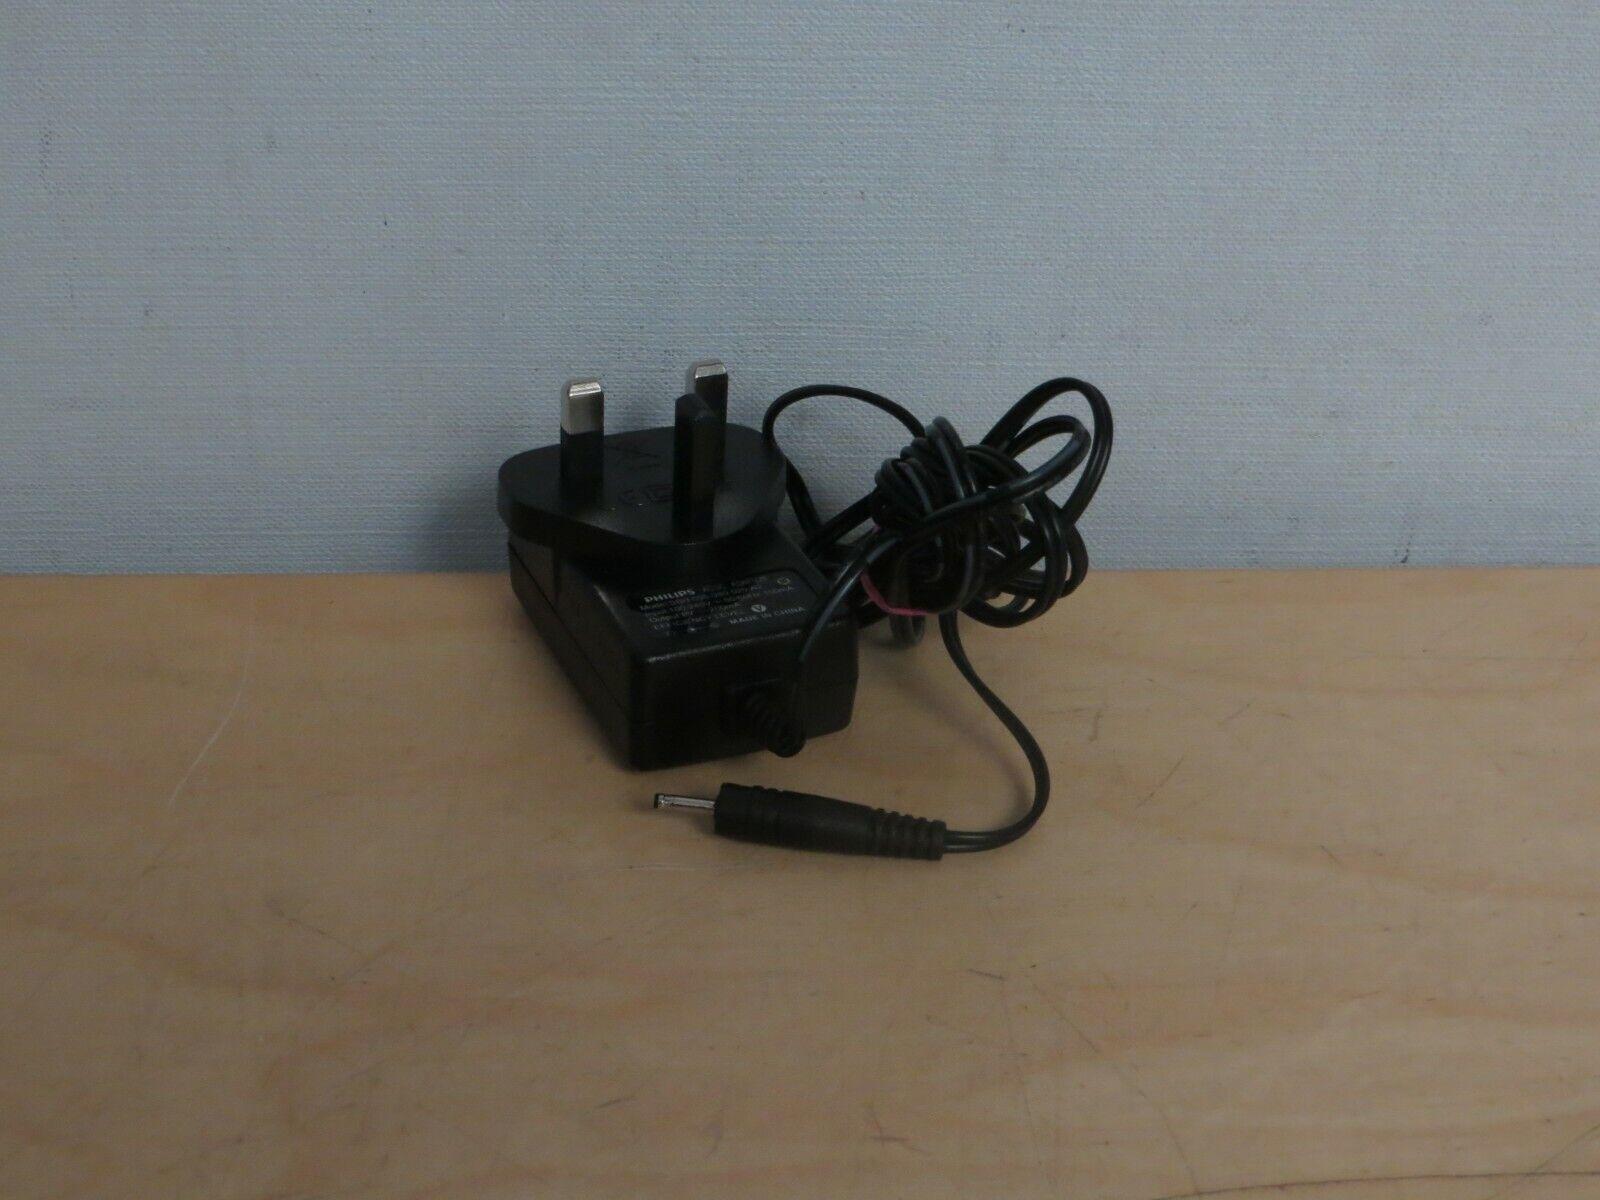 Genuine Philips SBH-005-080-020-A2 Power Supply UK PLUG inc VAT